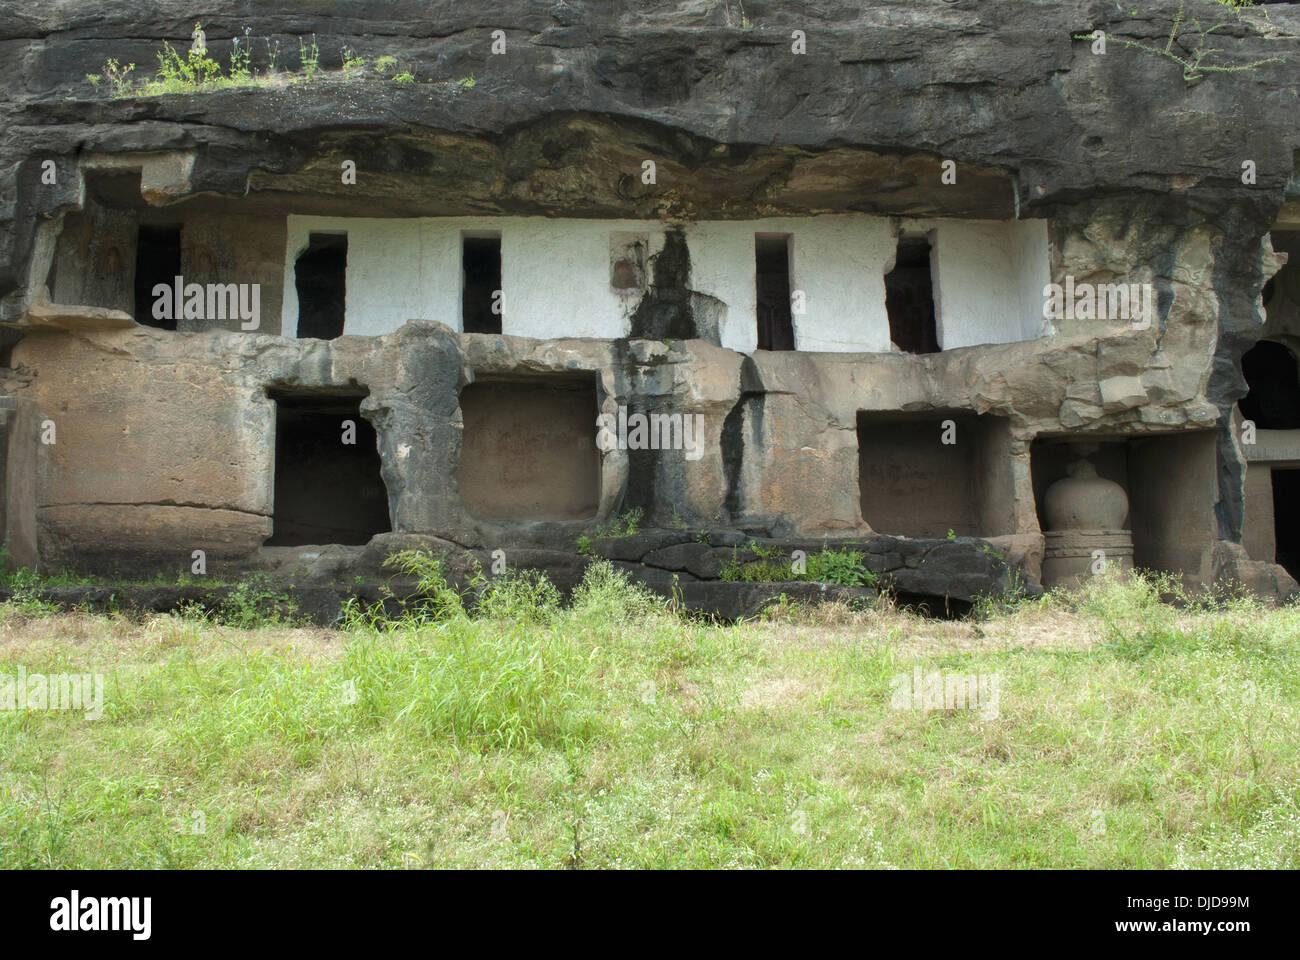 ambika stock photos ambika stock images alamy amba ambika group of caves junnar dist pune general view of amba